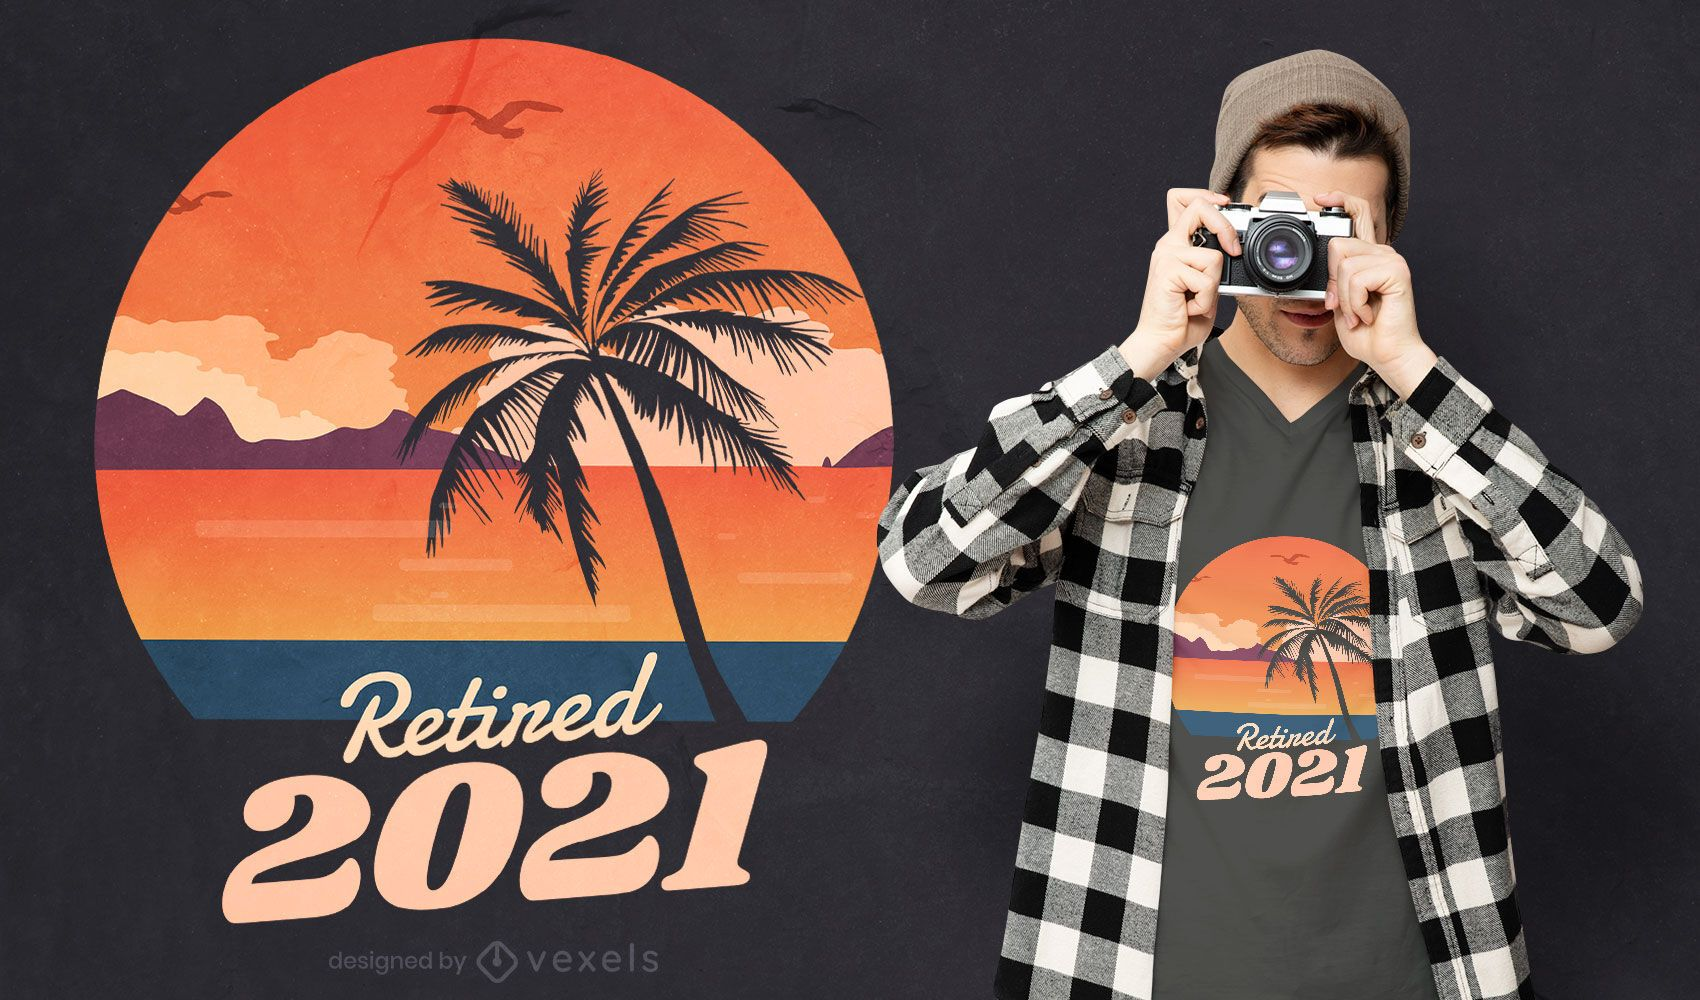 Retired 2021 beach landscape t-shirt design